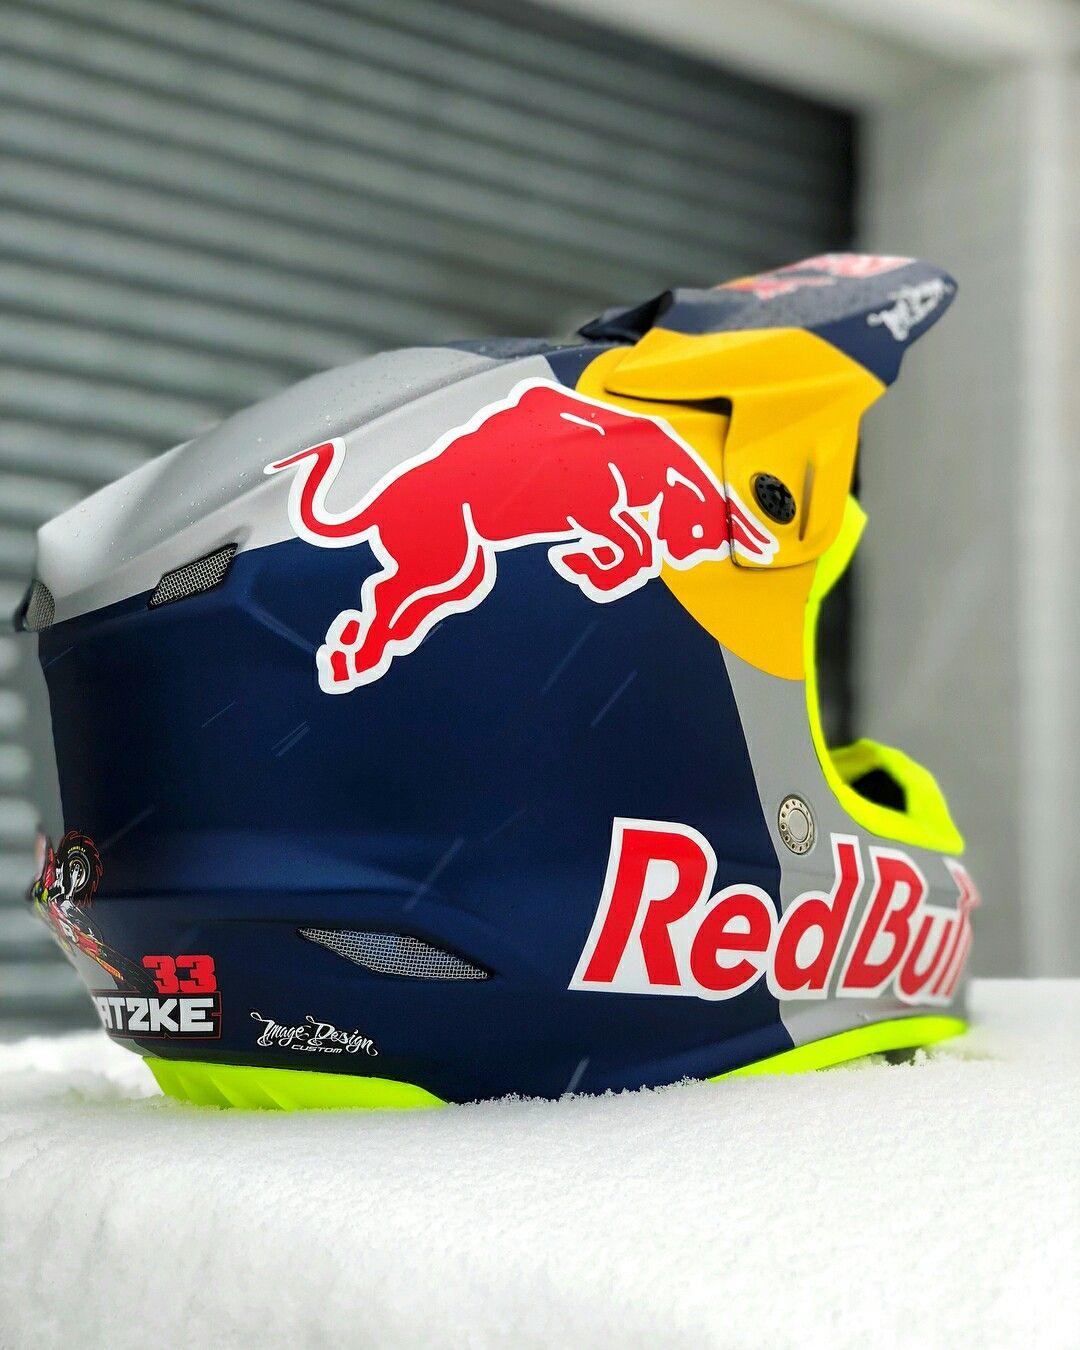 Pin By Andres F Quenan On Helmet Motocross Gear Racing Helmets Dirt Bike Gear